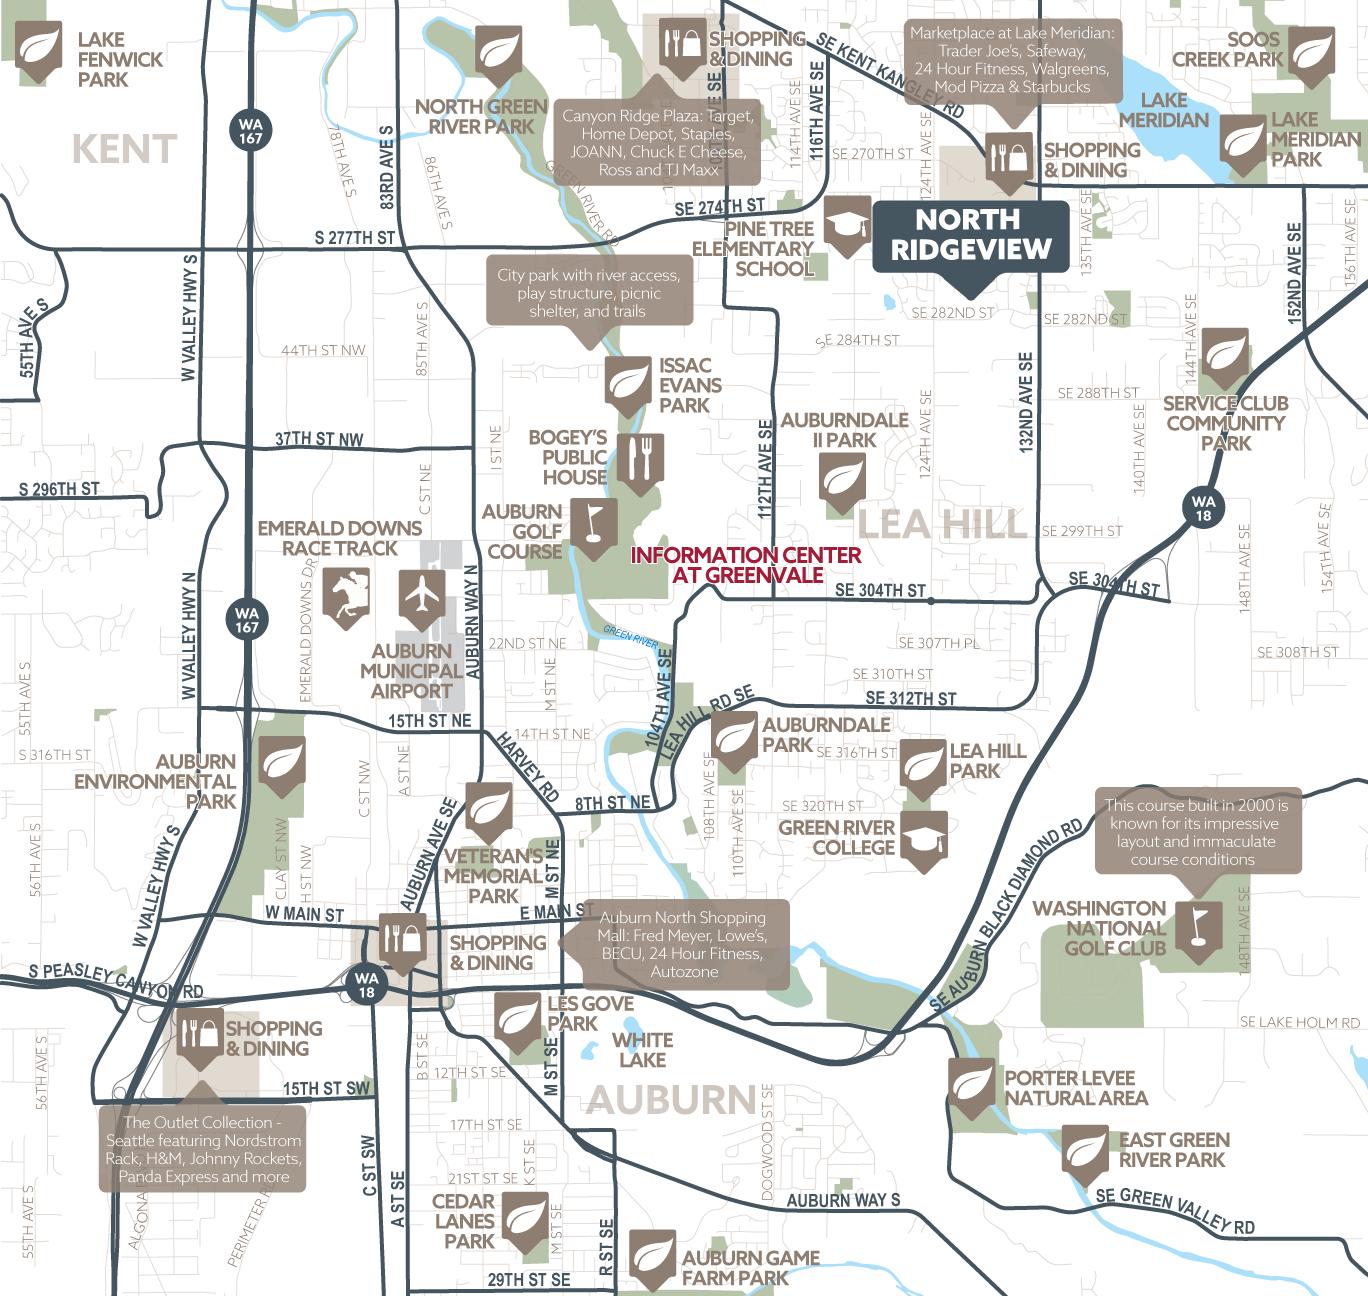 North Ridgeview amenity map